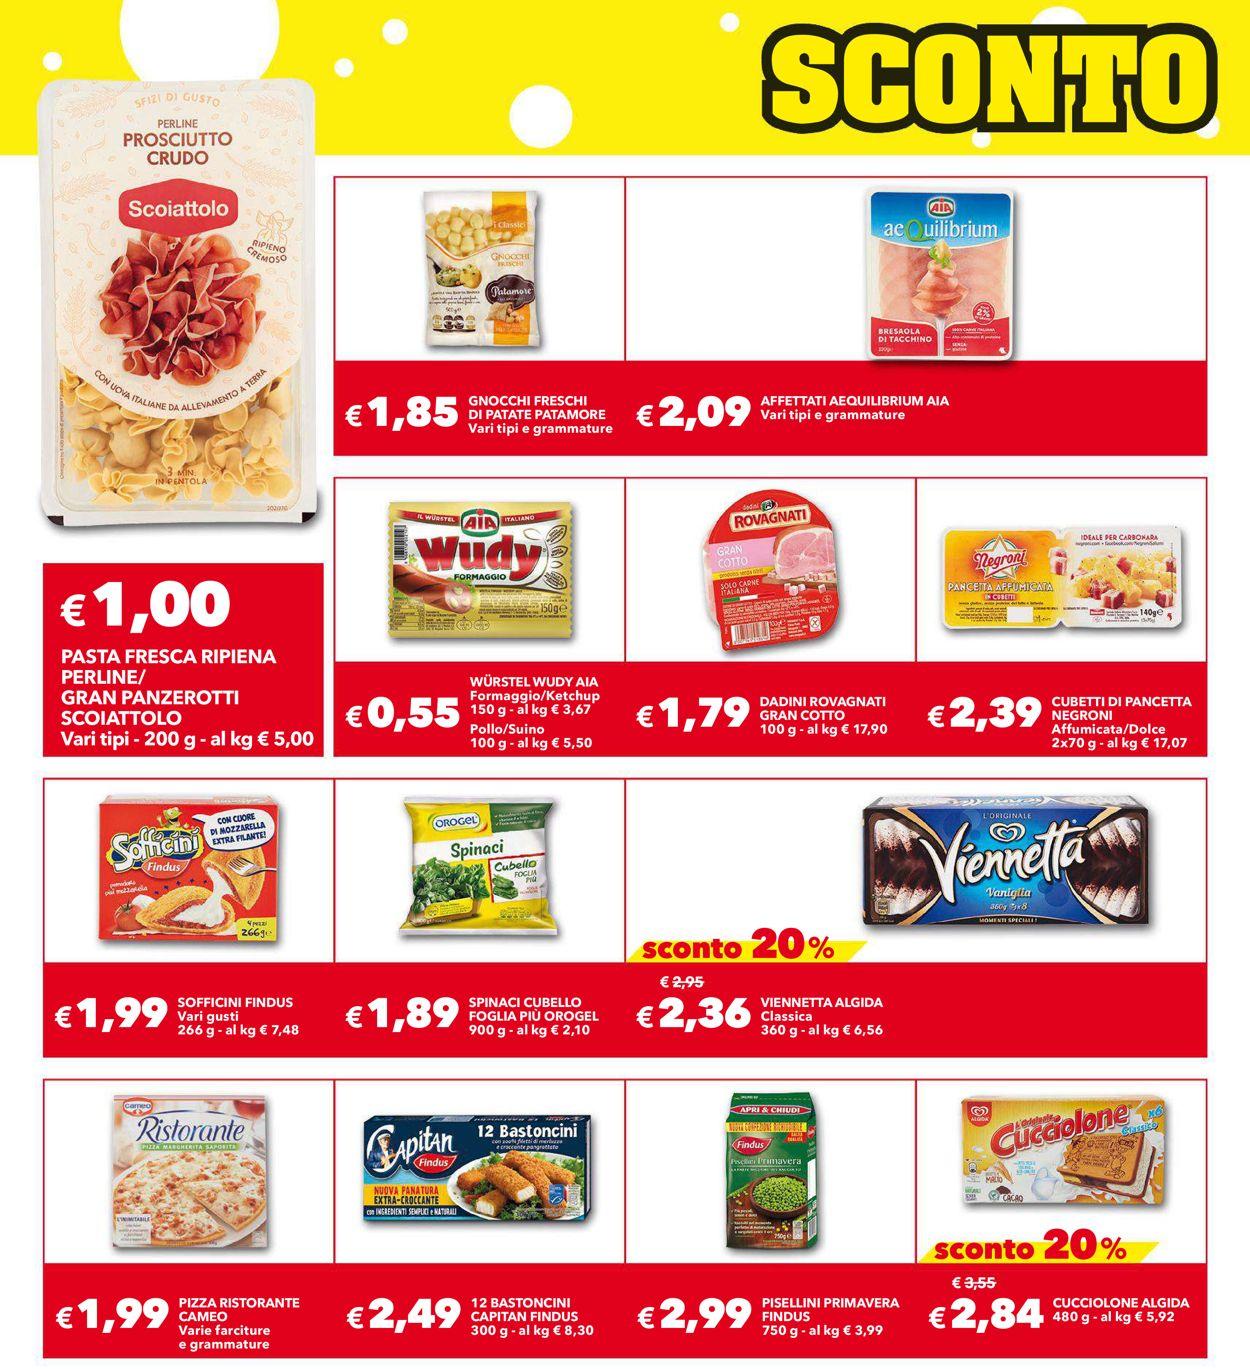 Volantino Auchan - Offerte 27/08-09/09/2020 (Pagina 6)